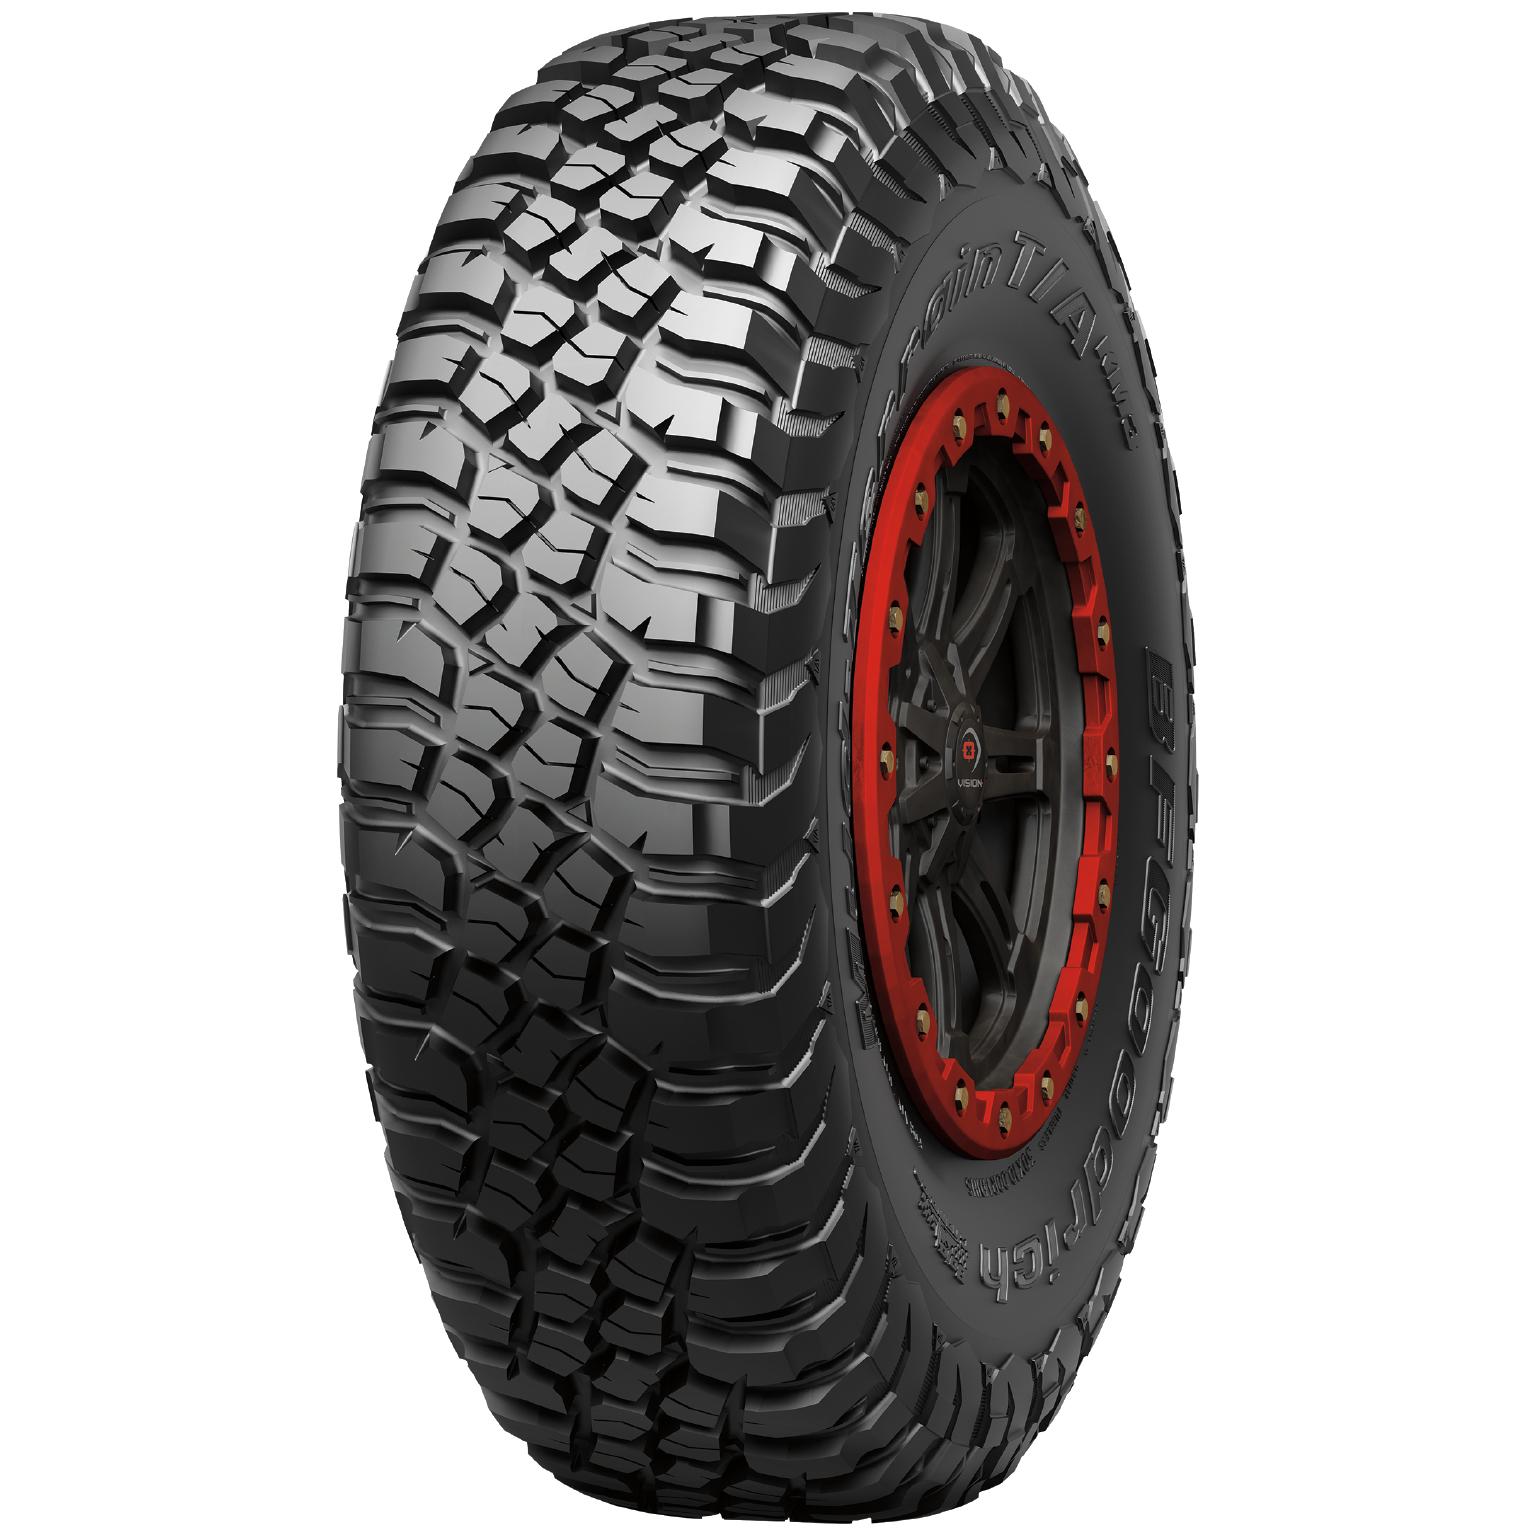 BF Goodrich BFG KM3 Mud Terrain UTV Tire 29937 32x10R14